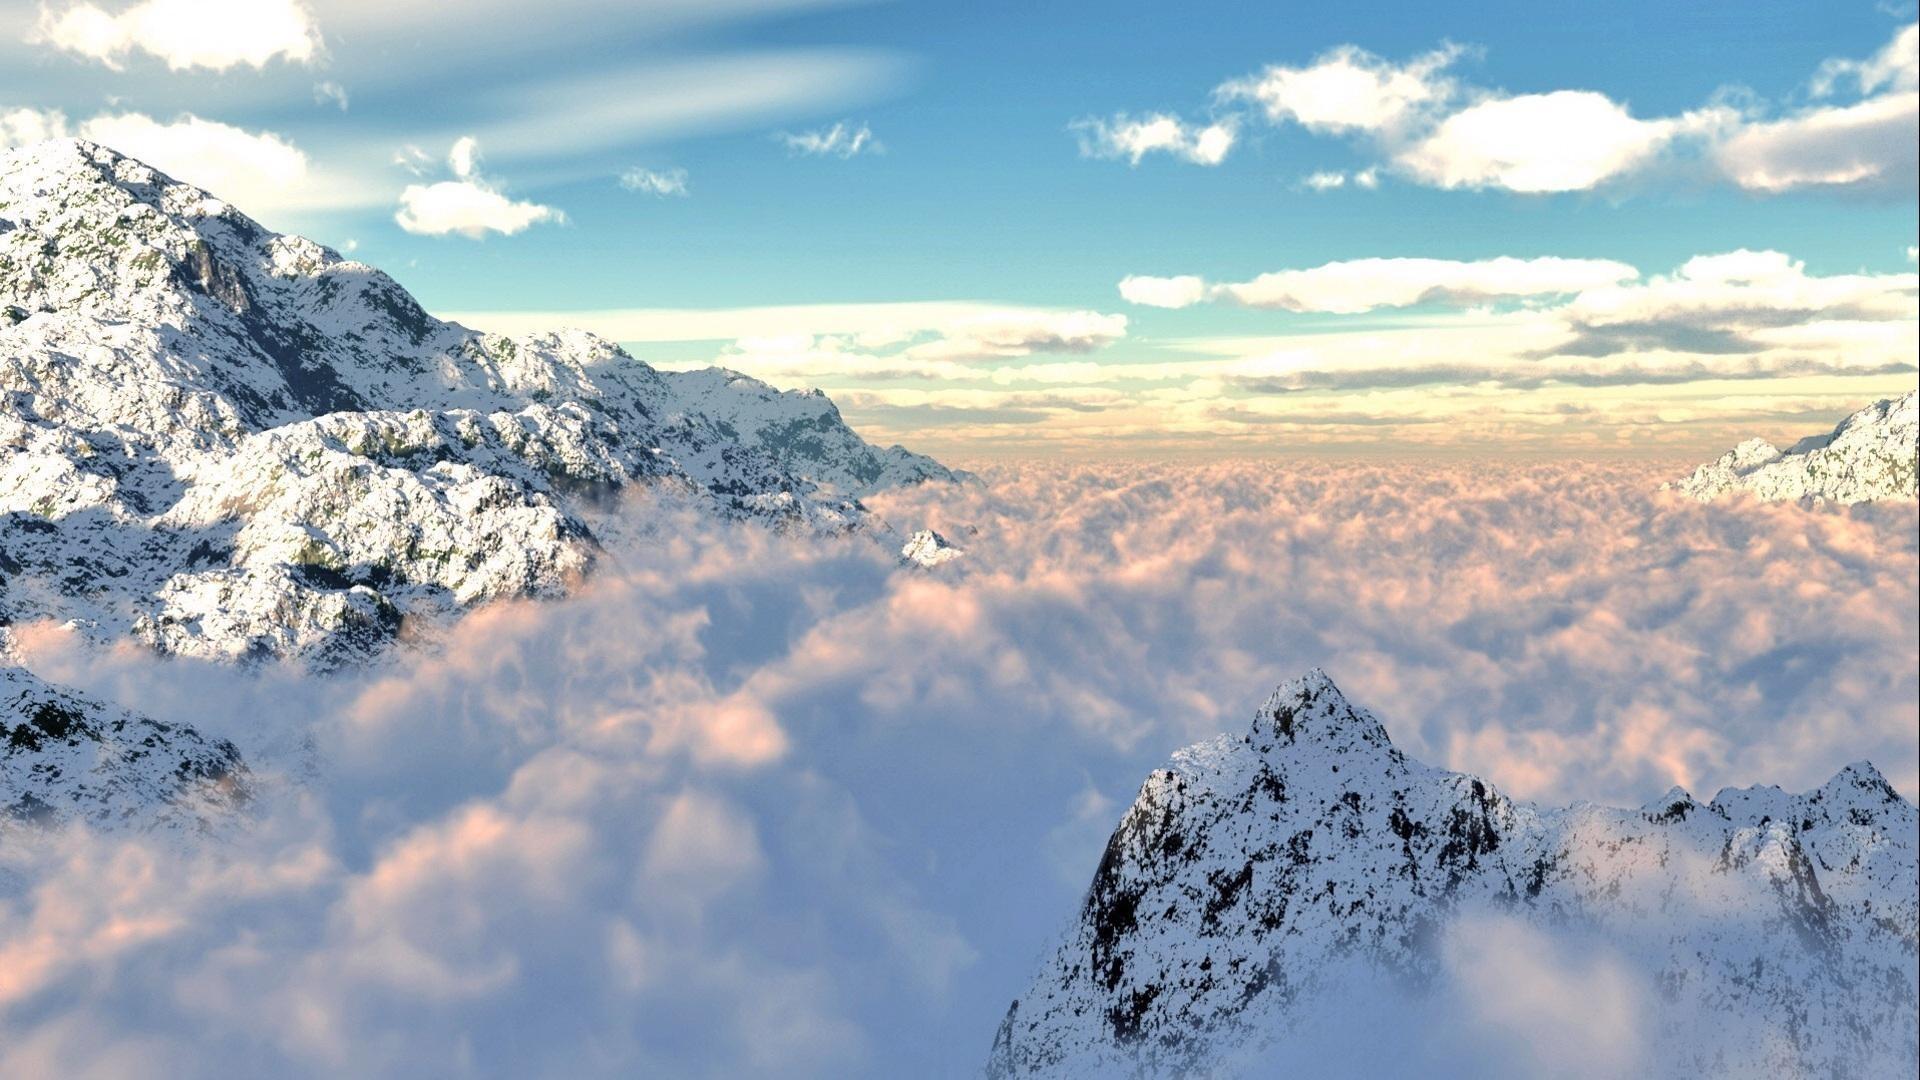 Best 40 Mountain View Wallpaper on HipWallpaper Nice View 1920x1080